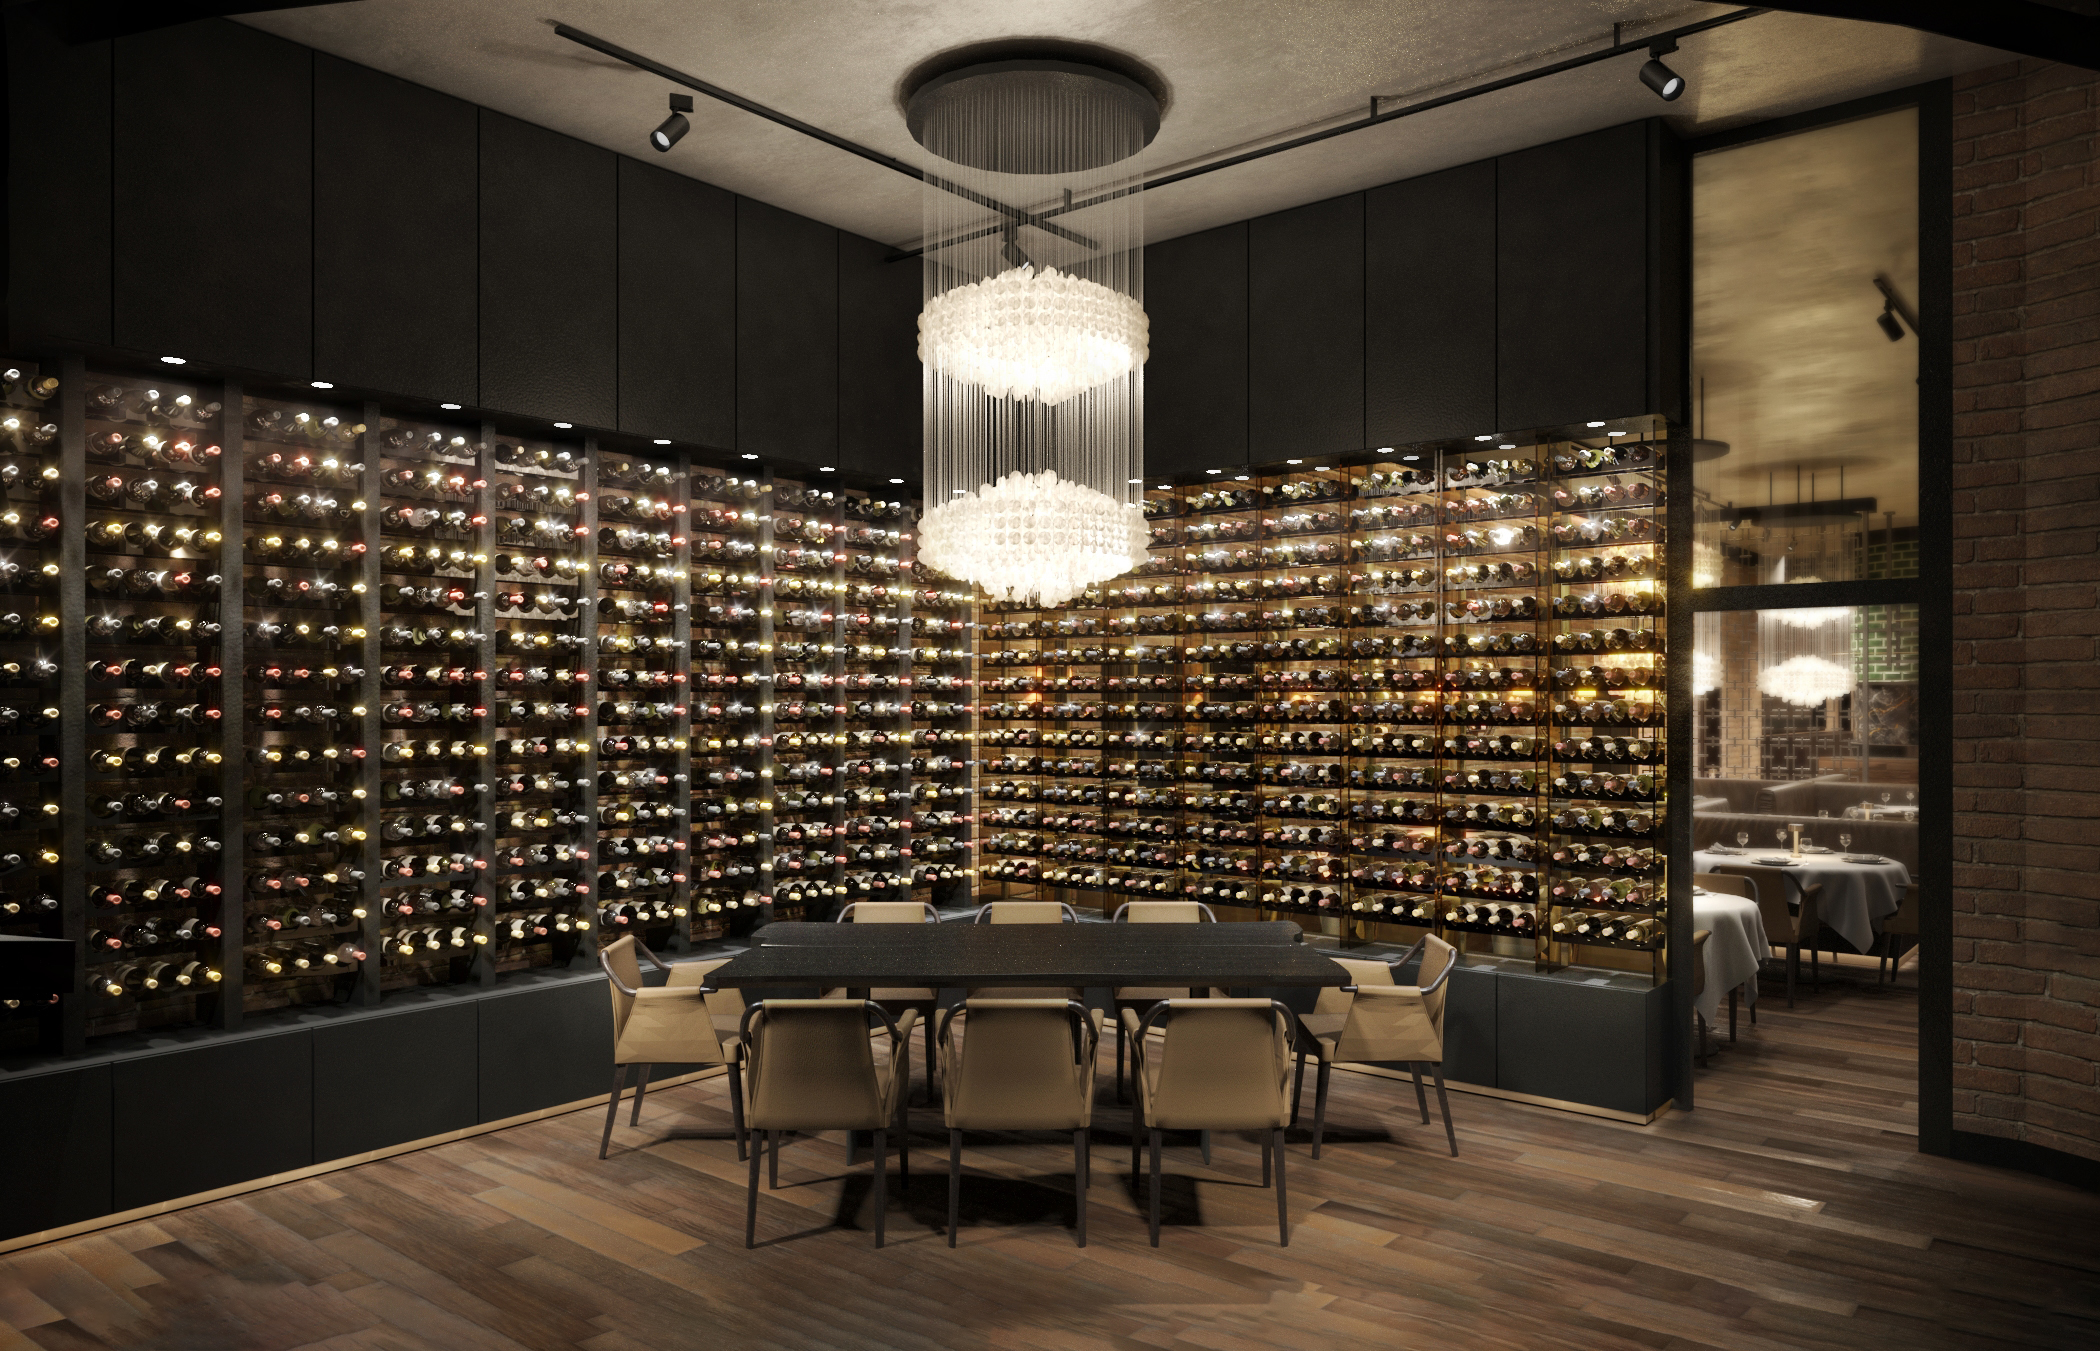 https://martinuzzi.ch/wp-content/uploads/2019/12/Doppio_gusto_restaurant_wine_cellar_1-1.jpg